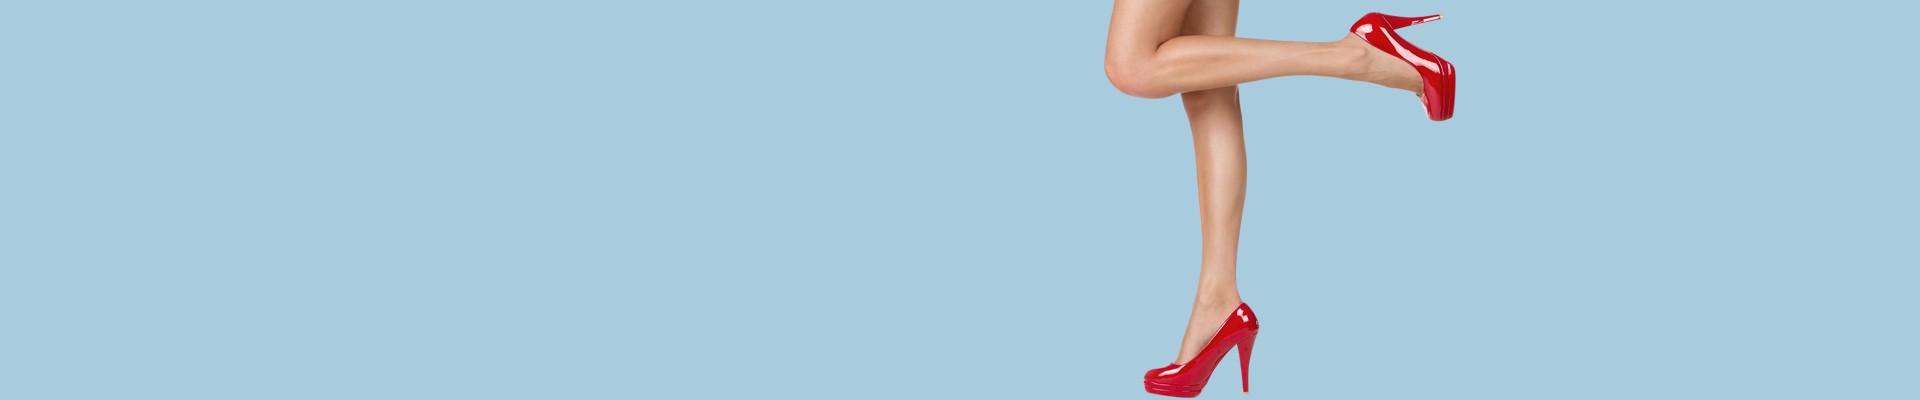 Jual Sepatu High Heels - Hak Tinggi Model Terbaru. Heels. Beranda›   Kategori Utama›  Fashion Wanita› ... 40615f2931